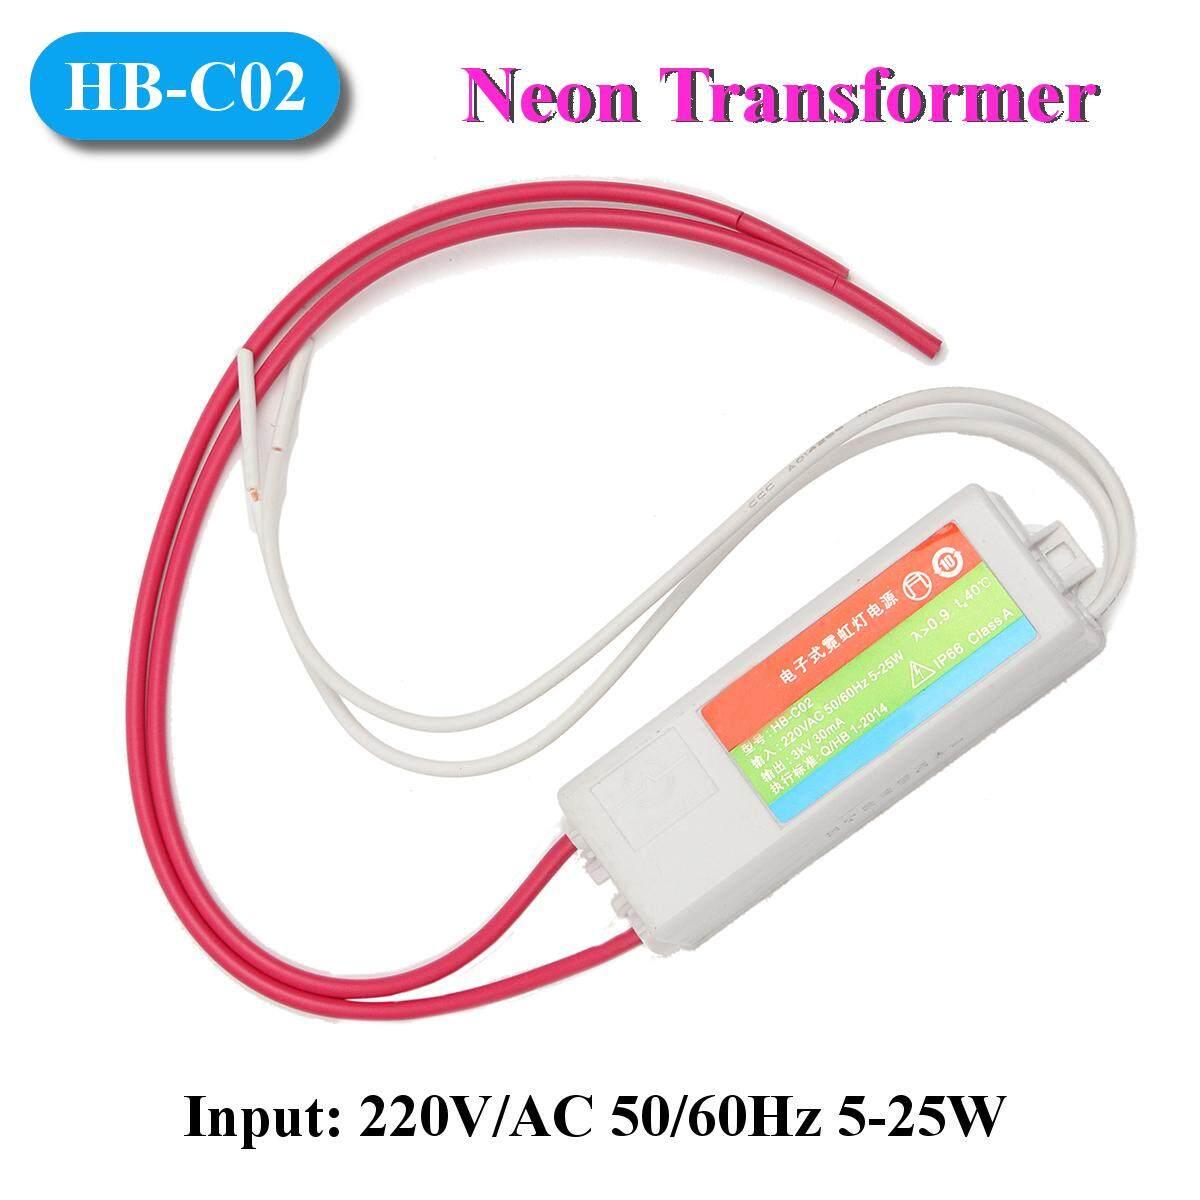 HB-C02 Plastic Neon Light Electronic Transformer 3KV 30mA Load Neon Sign Power Supply - intl - 5